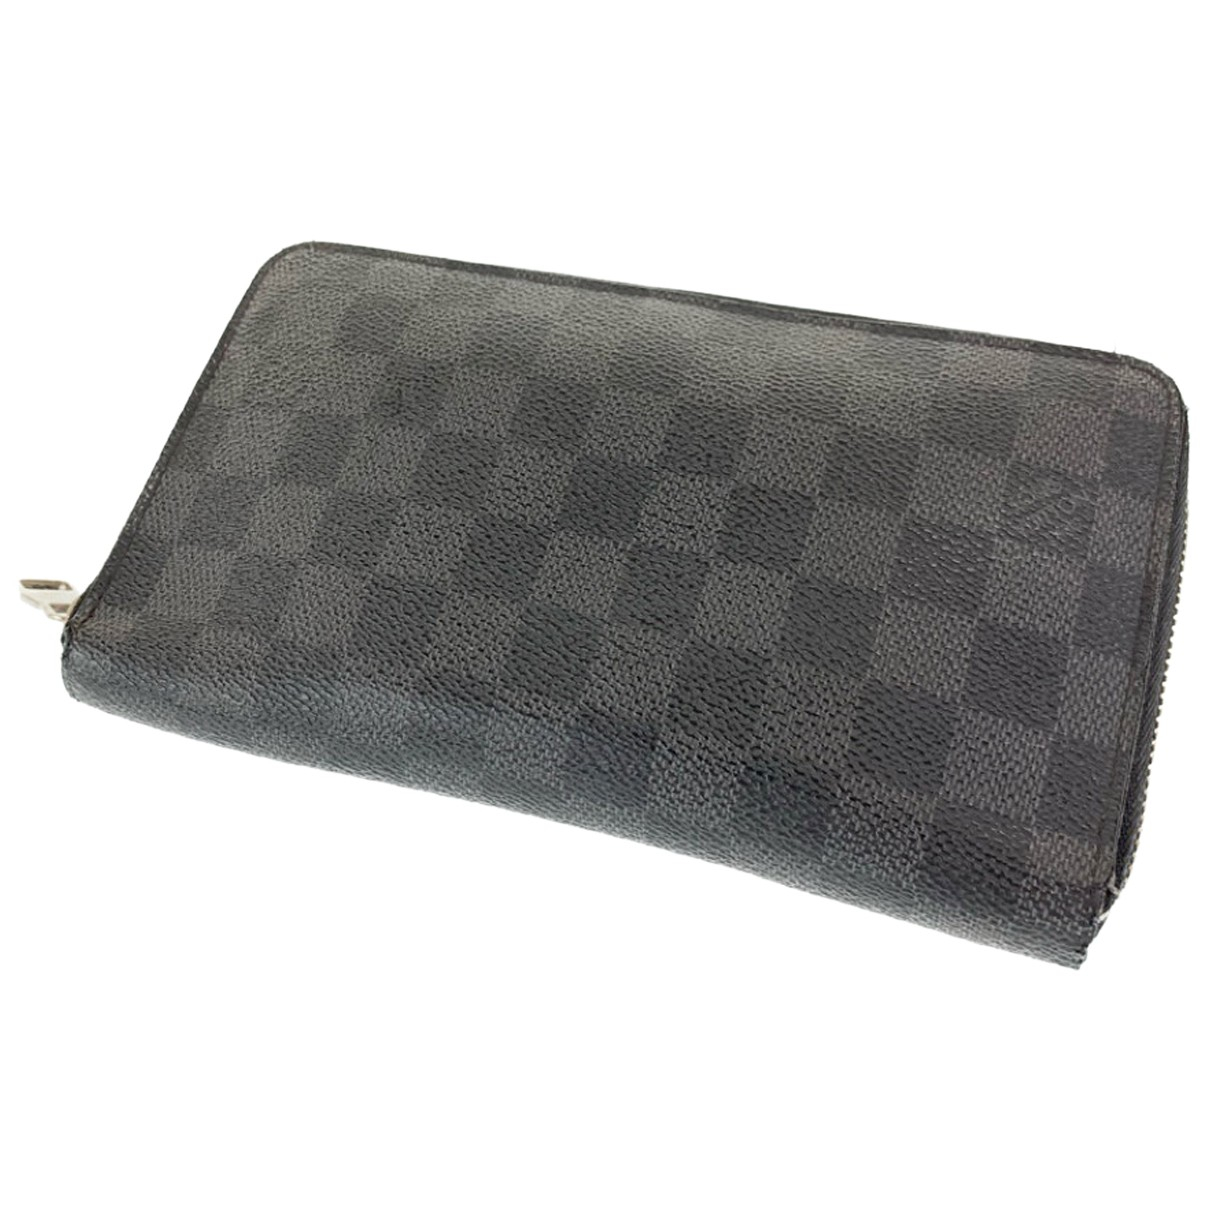 Louis Vuitton N Cloth Small bag, wallet & cases for Men N